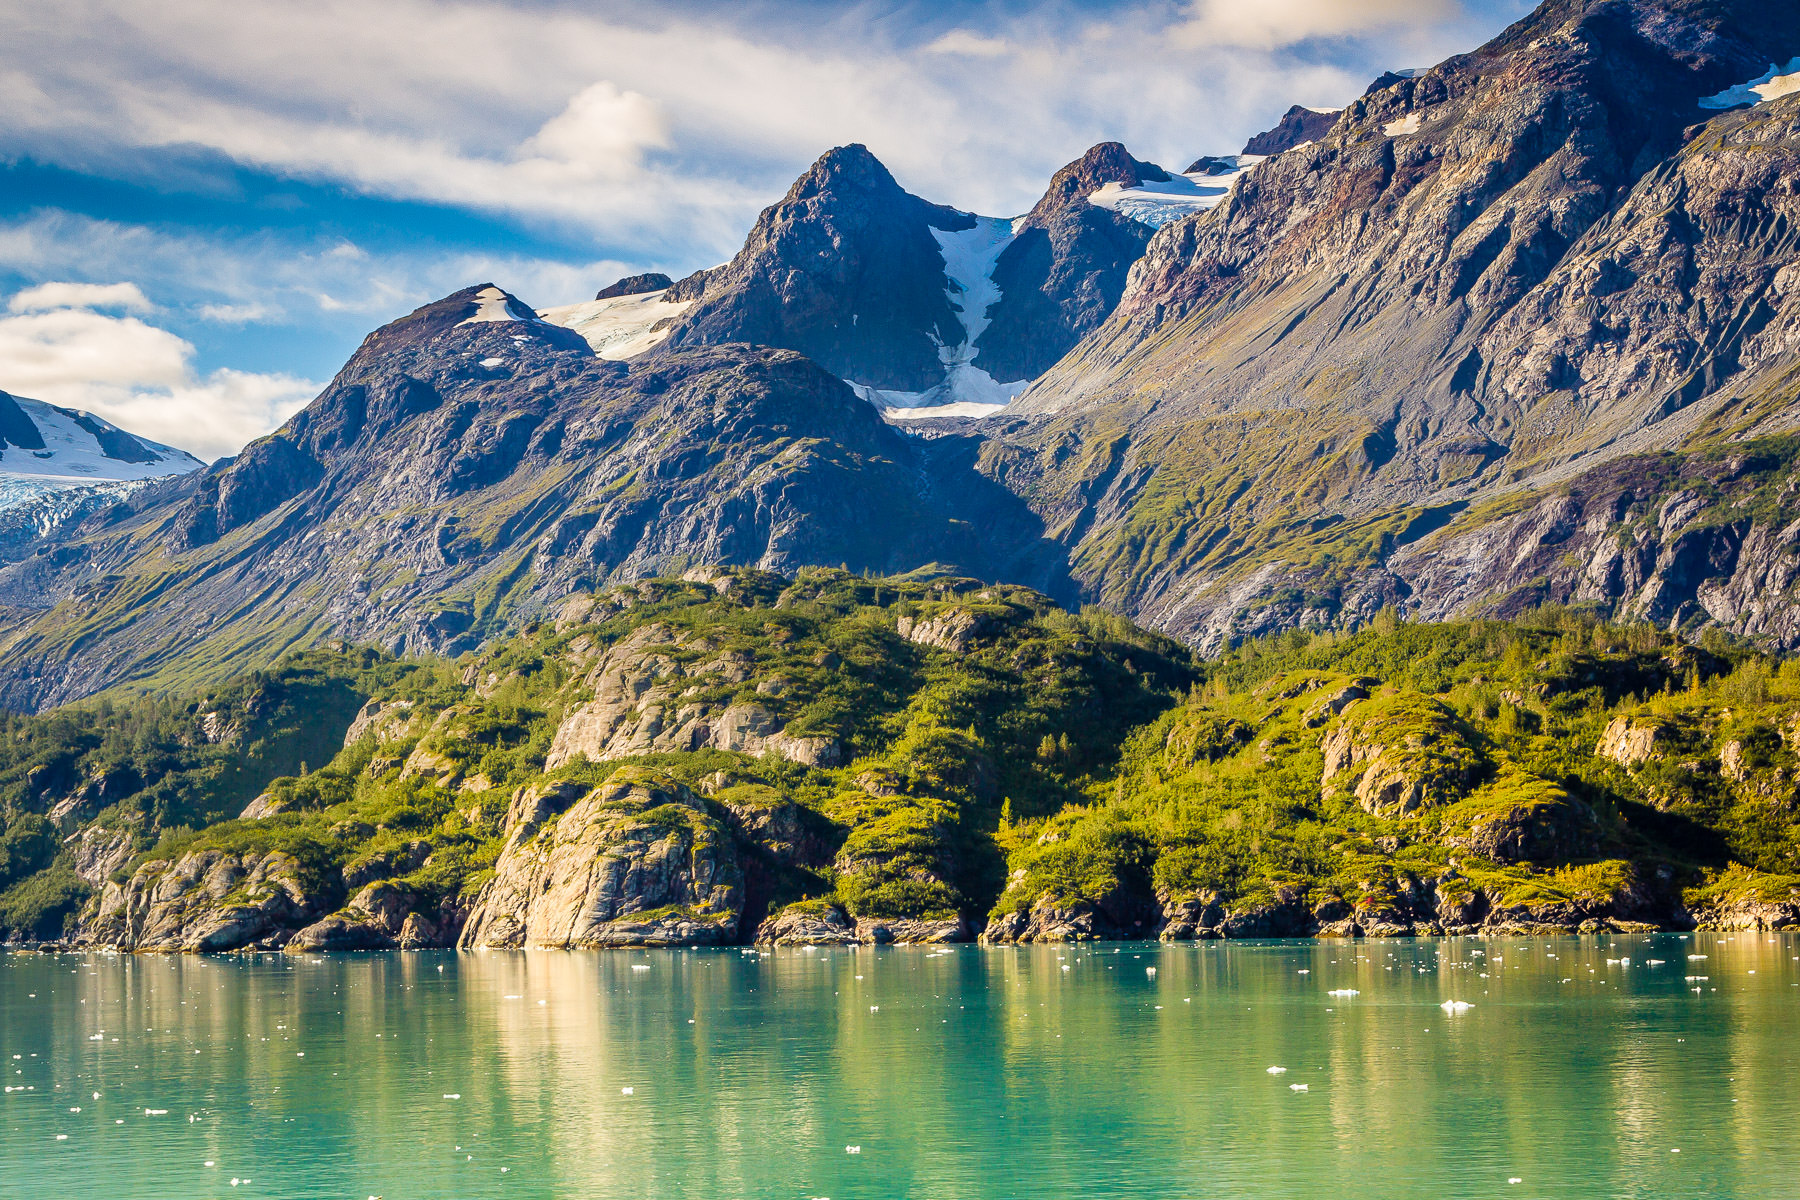 Trees grow along the shoreline of Alaska's Glacier Bay.